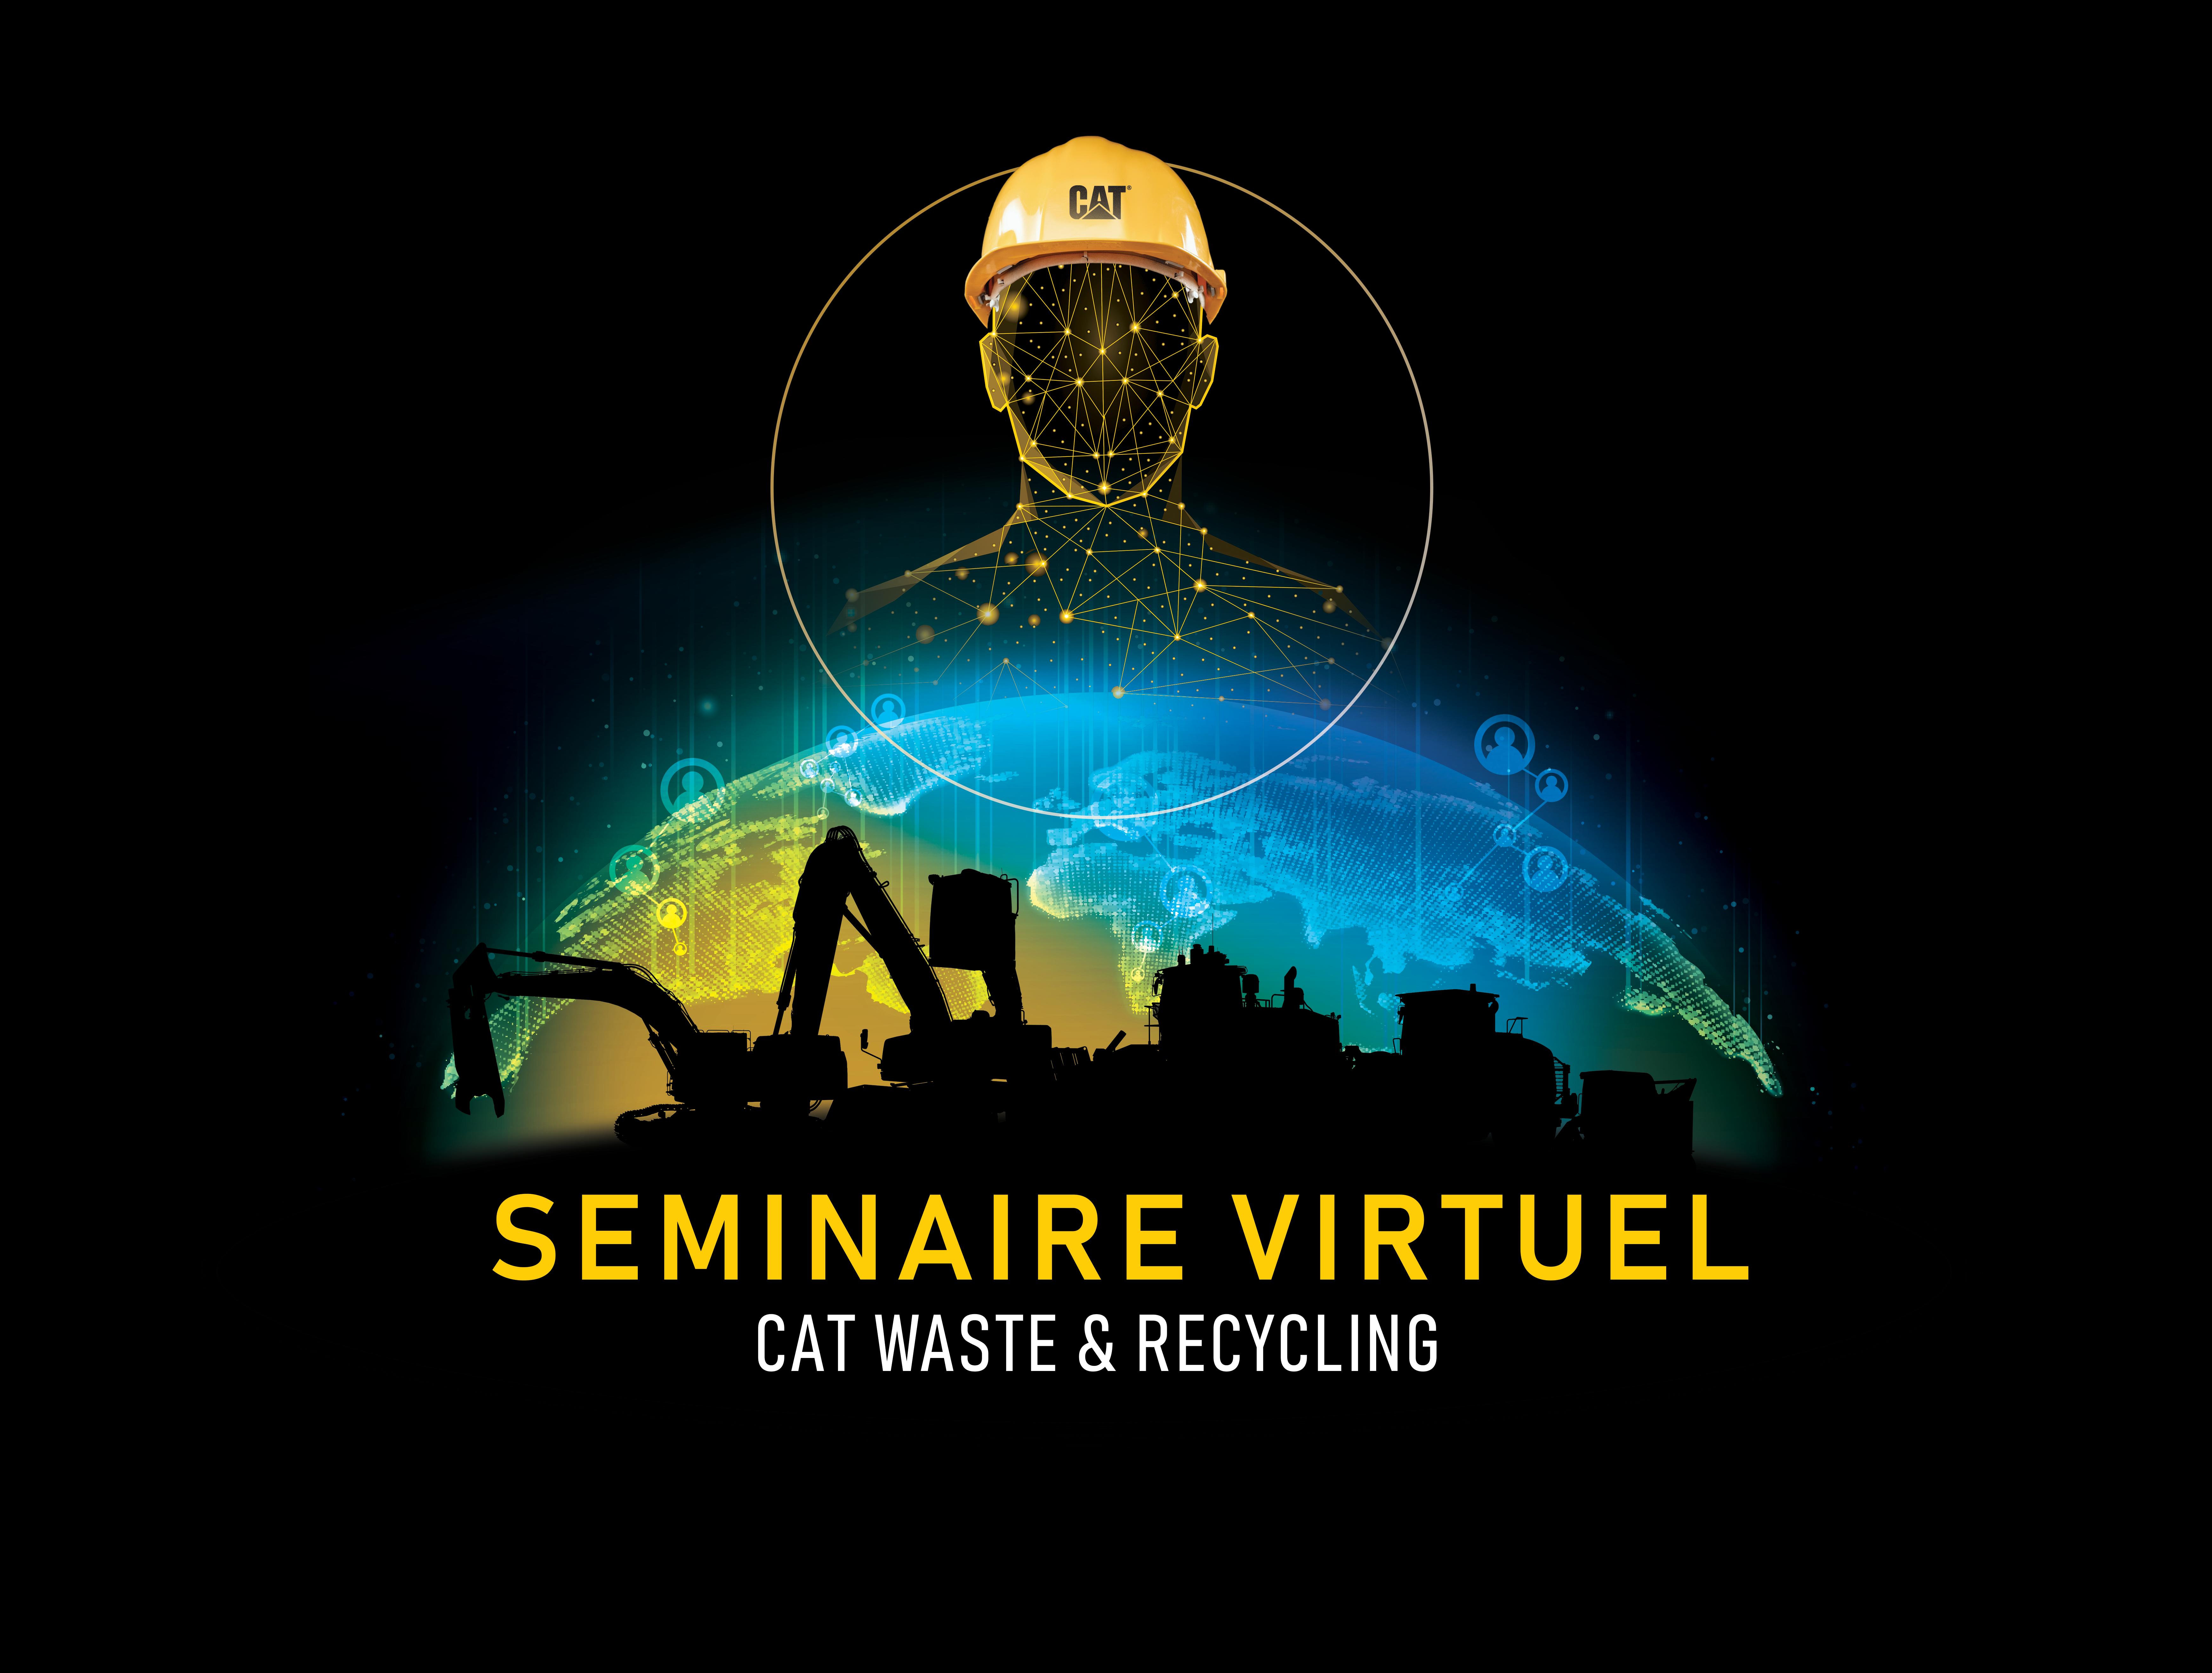 wr_seminar_virtual_man.png